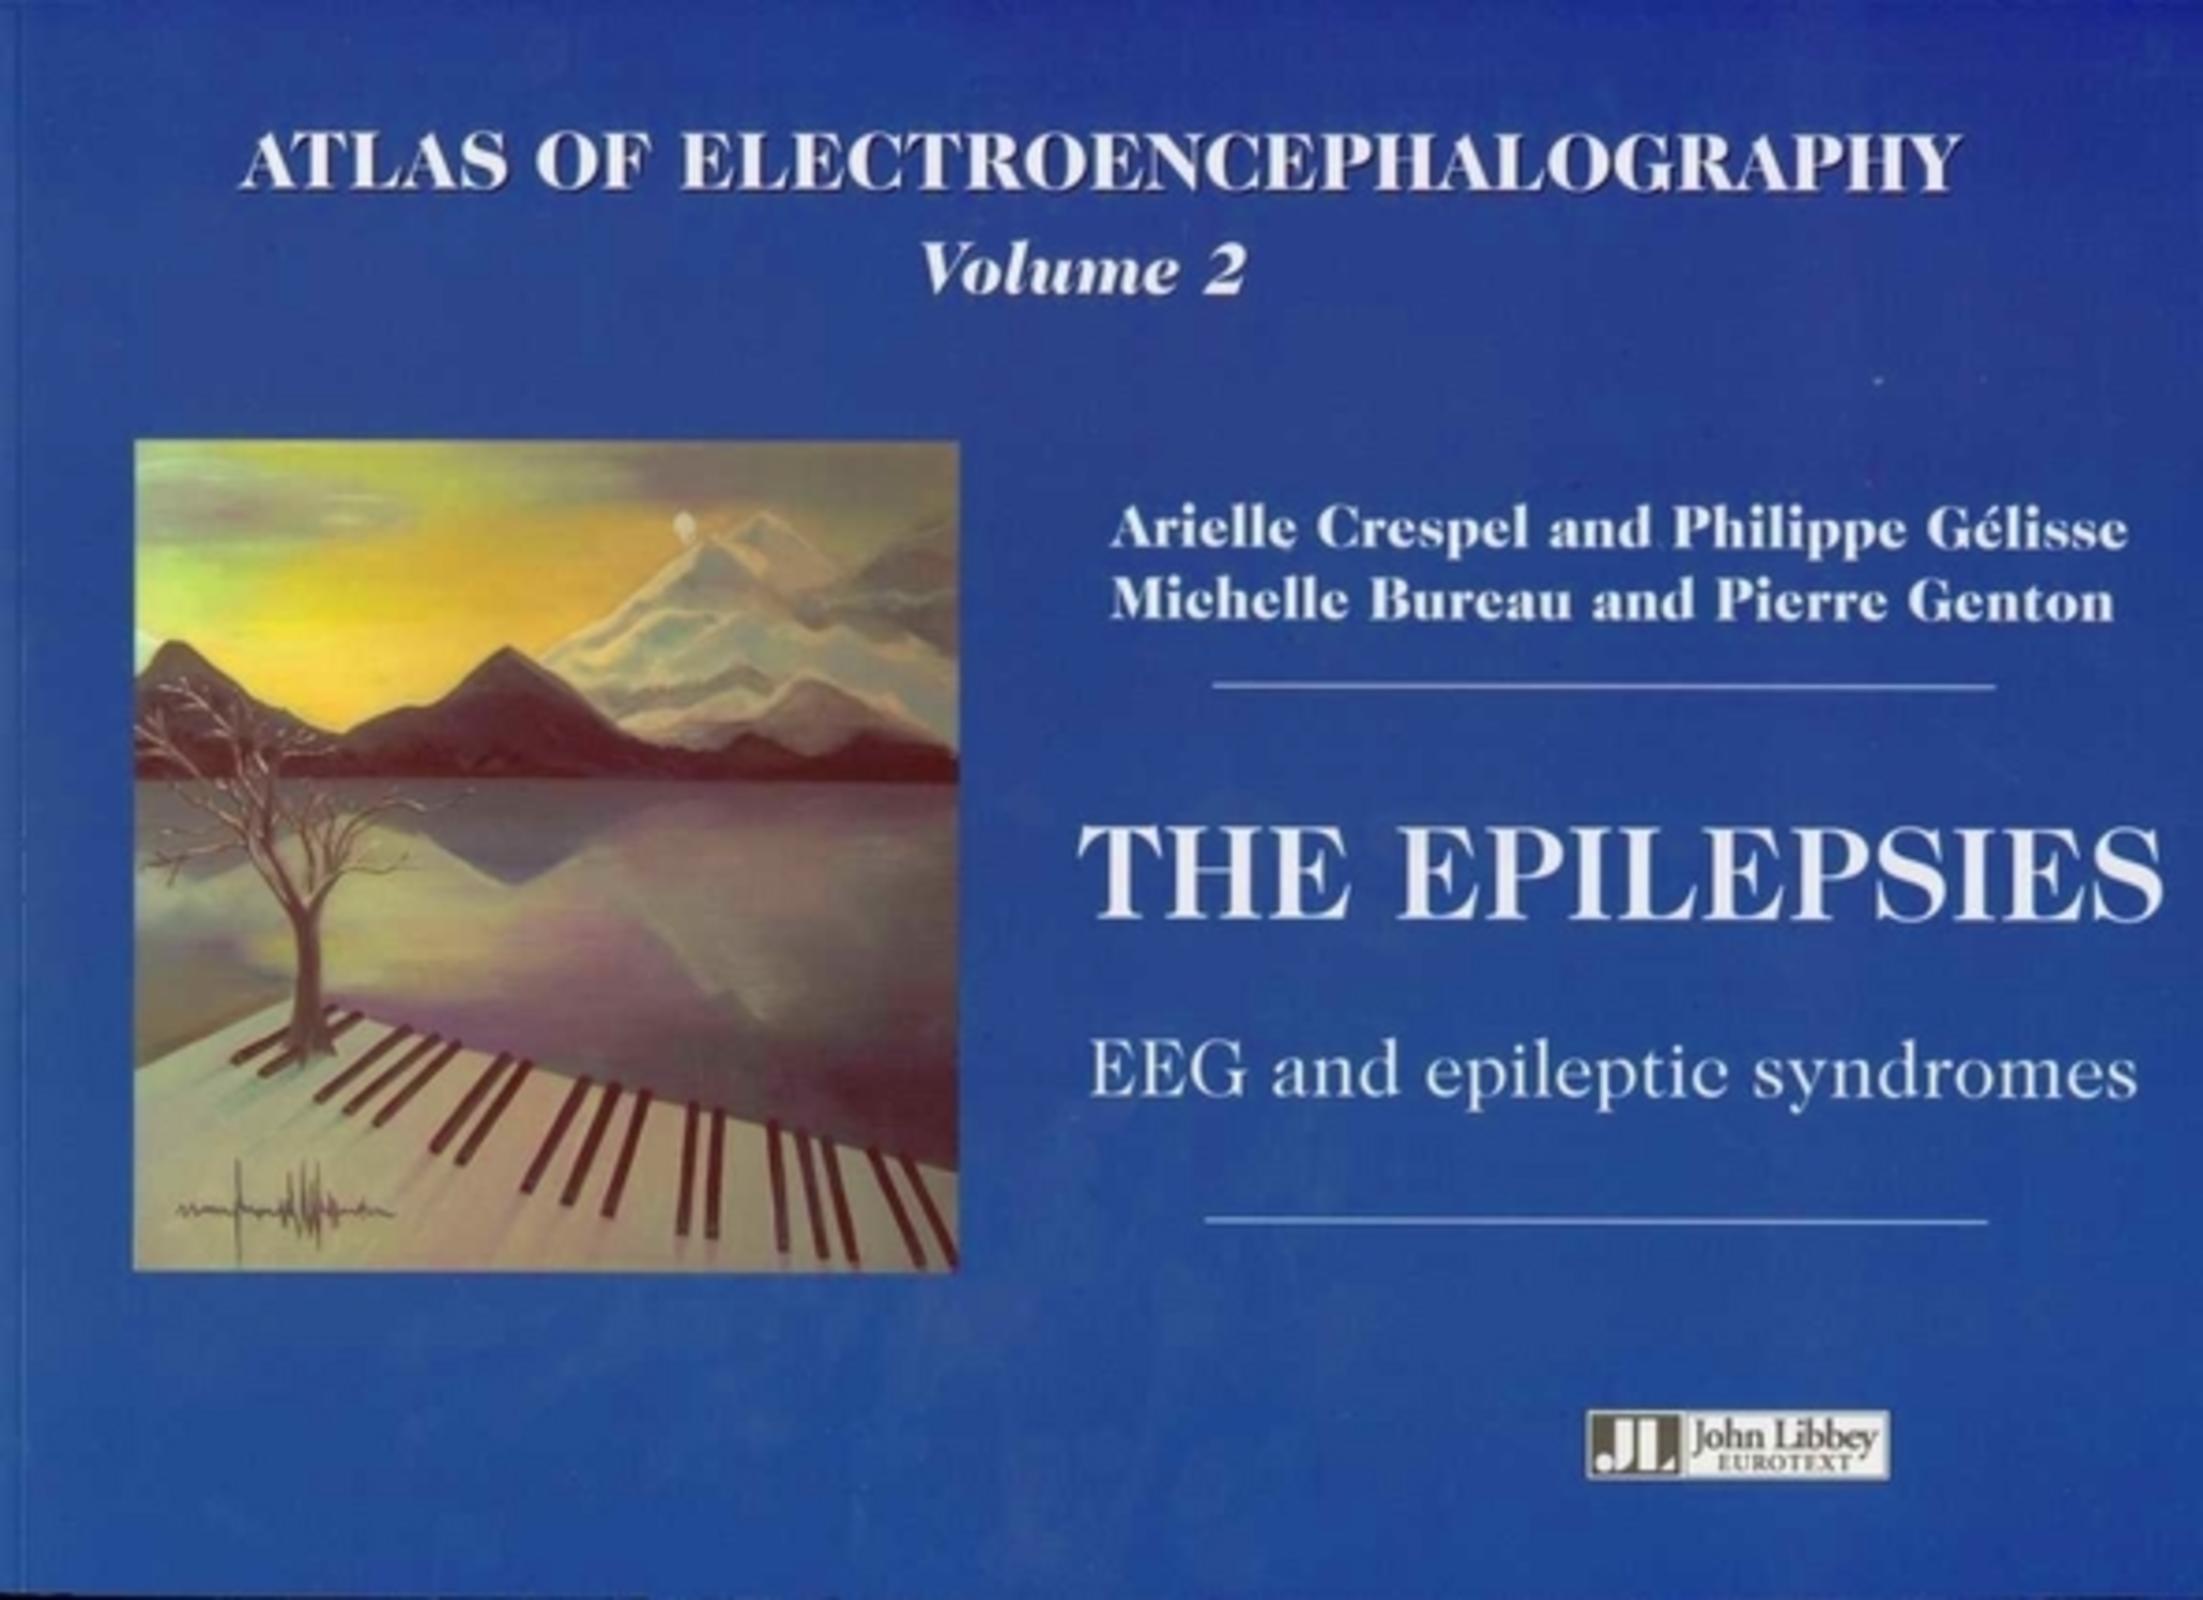 ATLAS OF ELECTROENCEPHALOGRAPHY VOLUME 2. THE EPILEPSIES EEG AND EPILEPTIC SYNDR